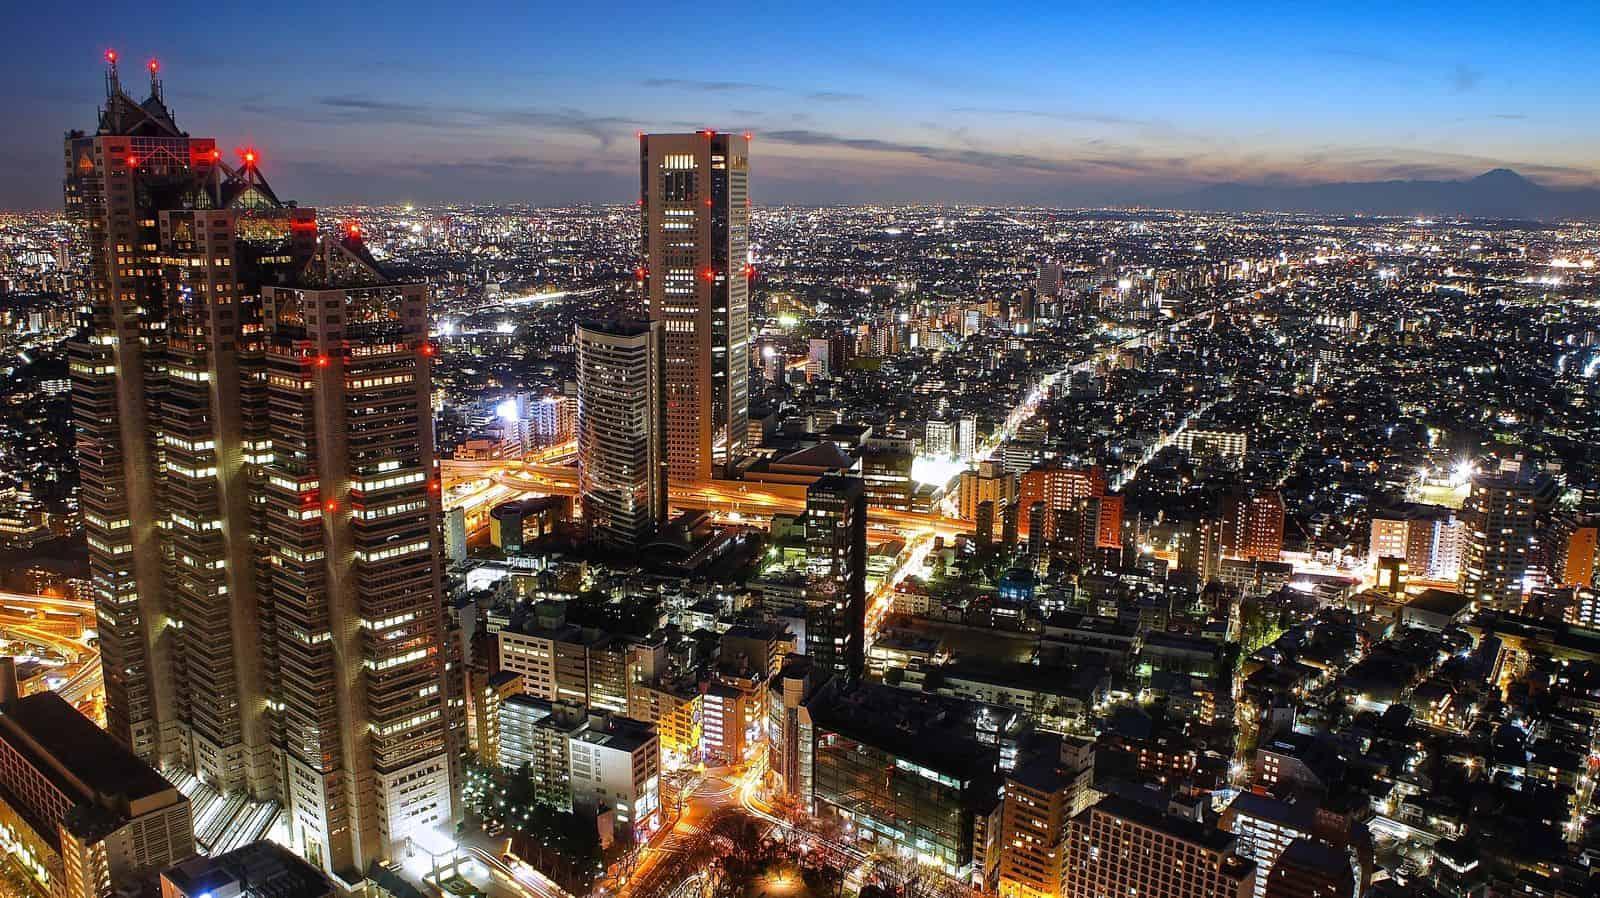 visit the Tokyo Metropolitan Government Building